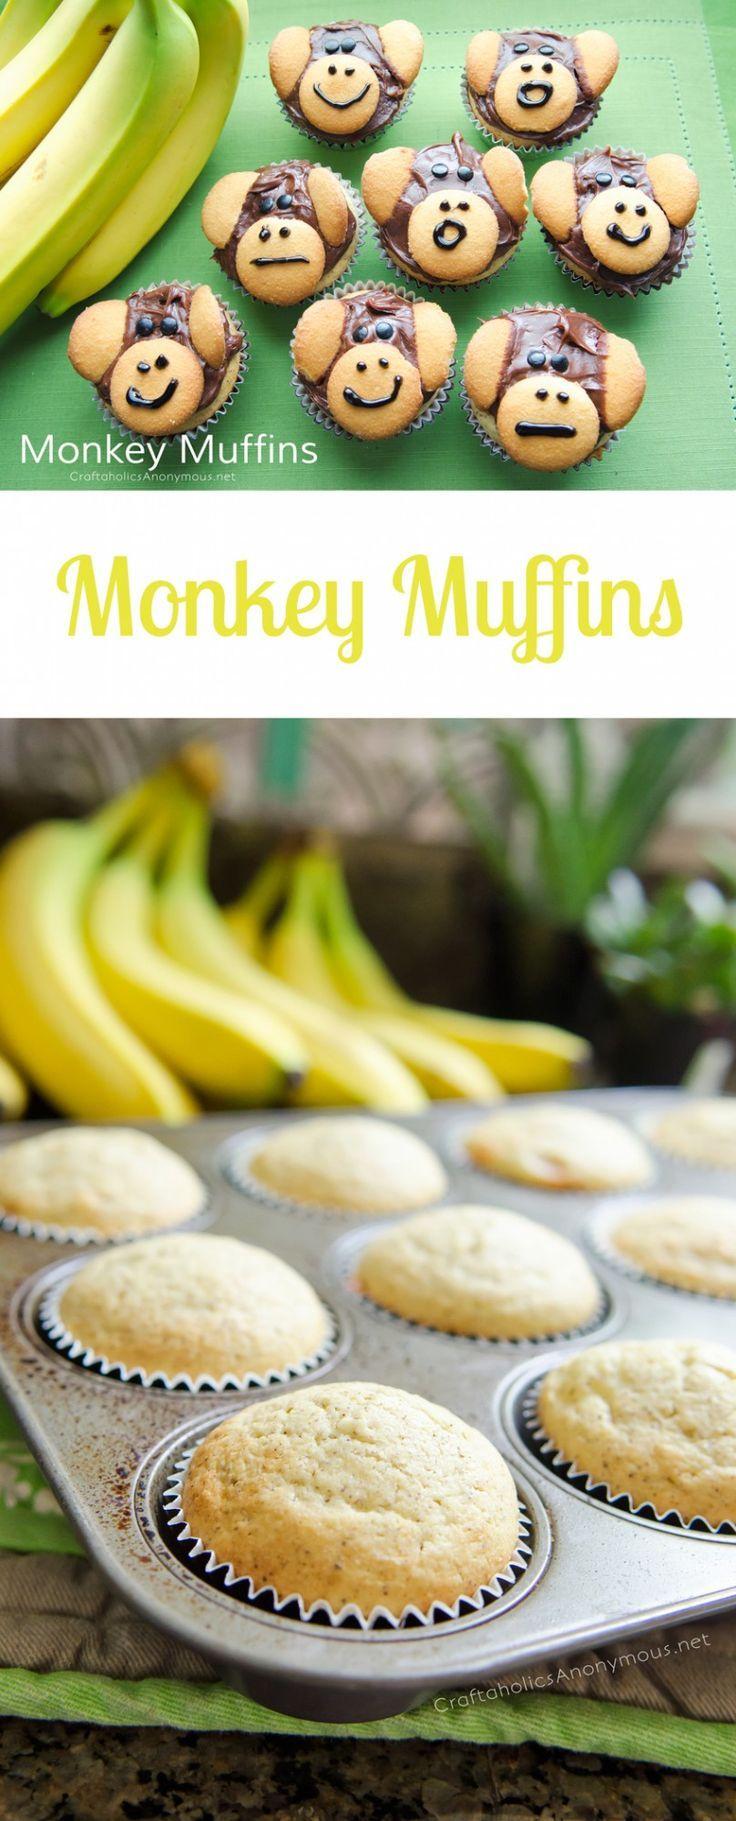 Banana Monkey Muffins Rainforests For Kids And Preschool